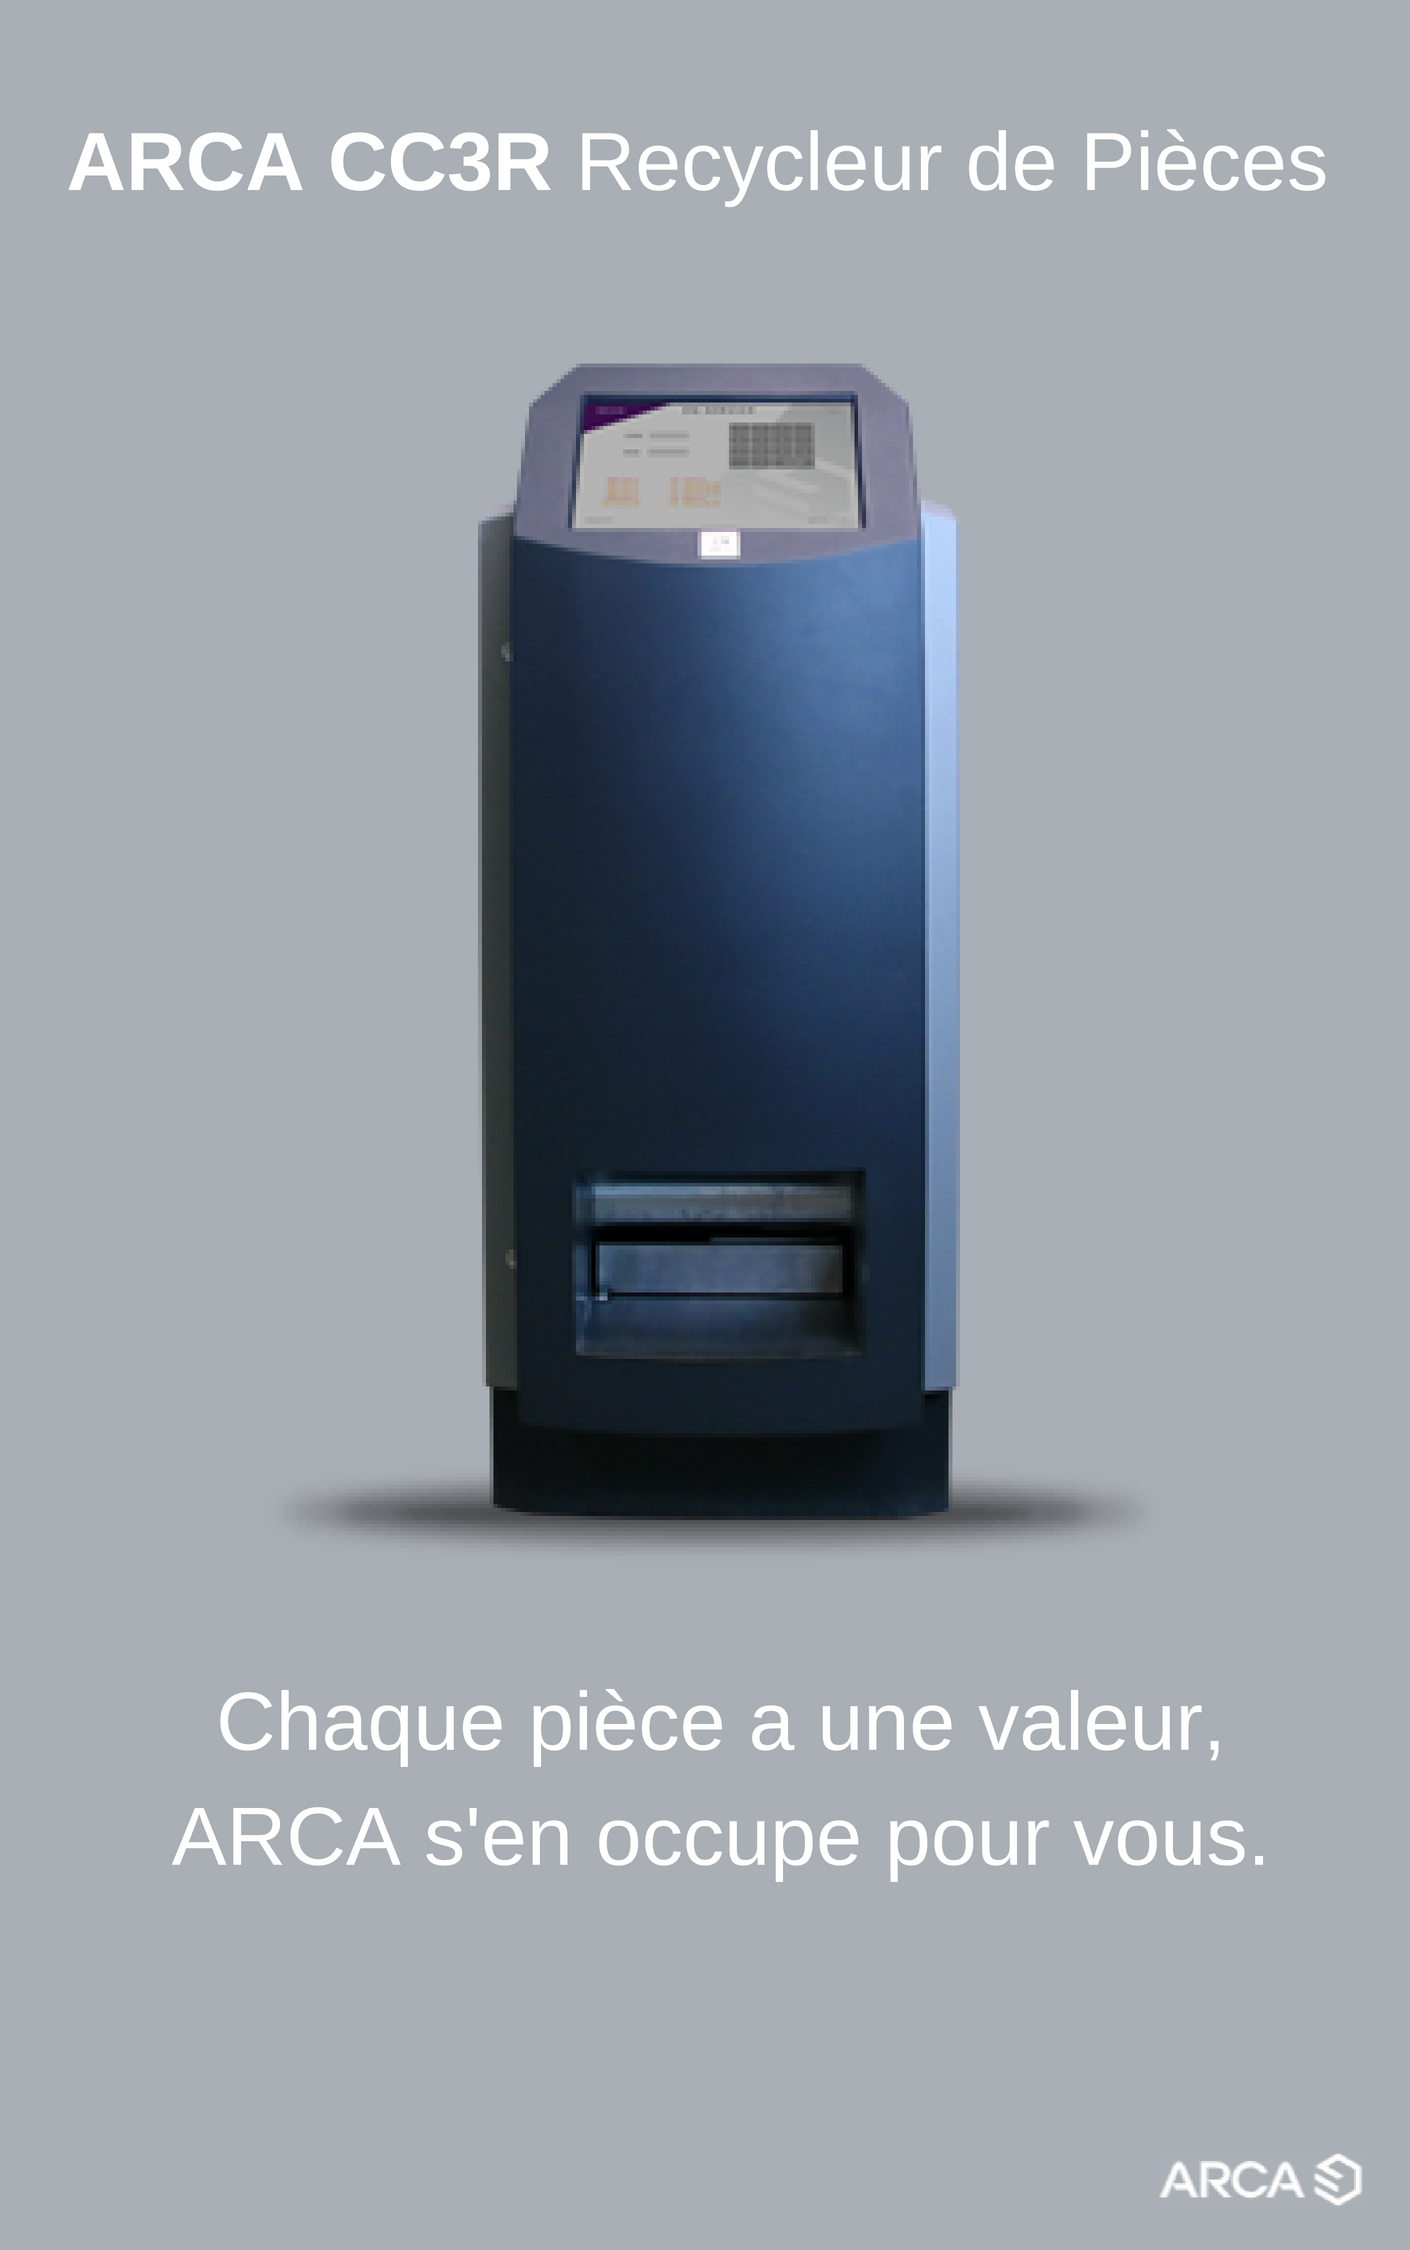 Brochure ARCA CC3R Recycleur de Pièces